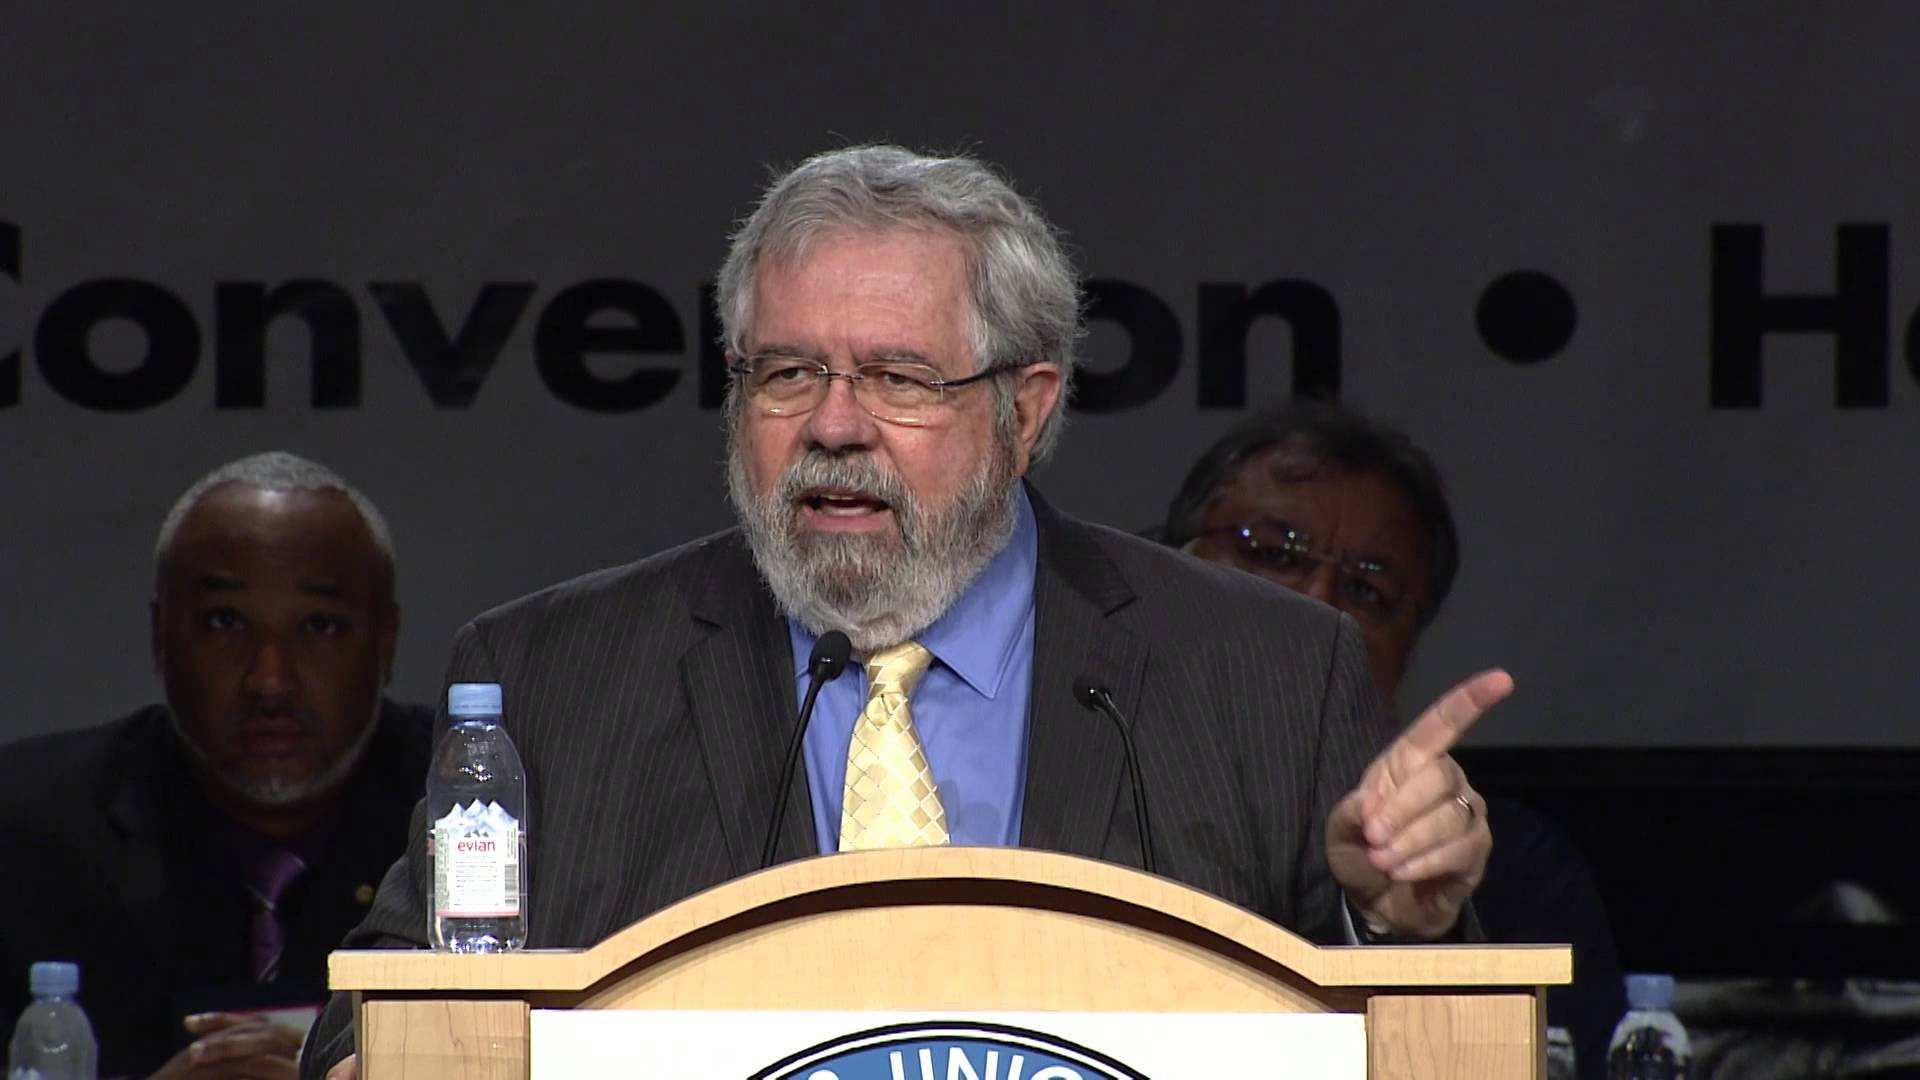 Reporter David Cay Johnston